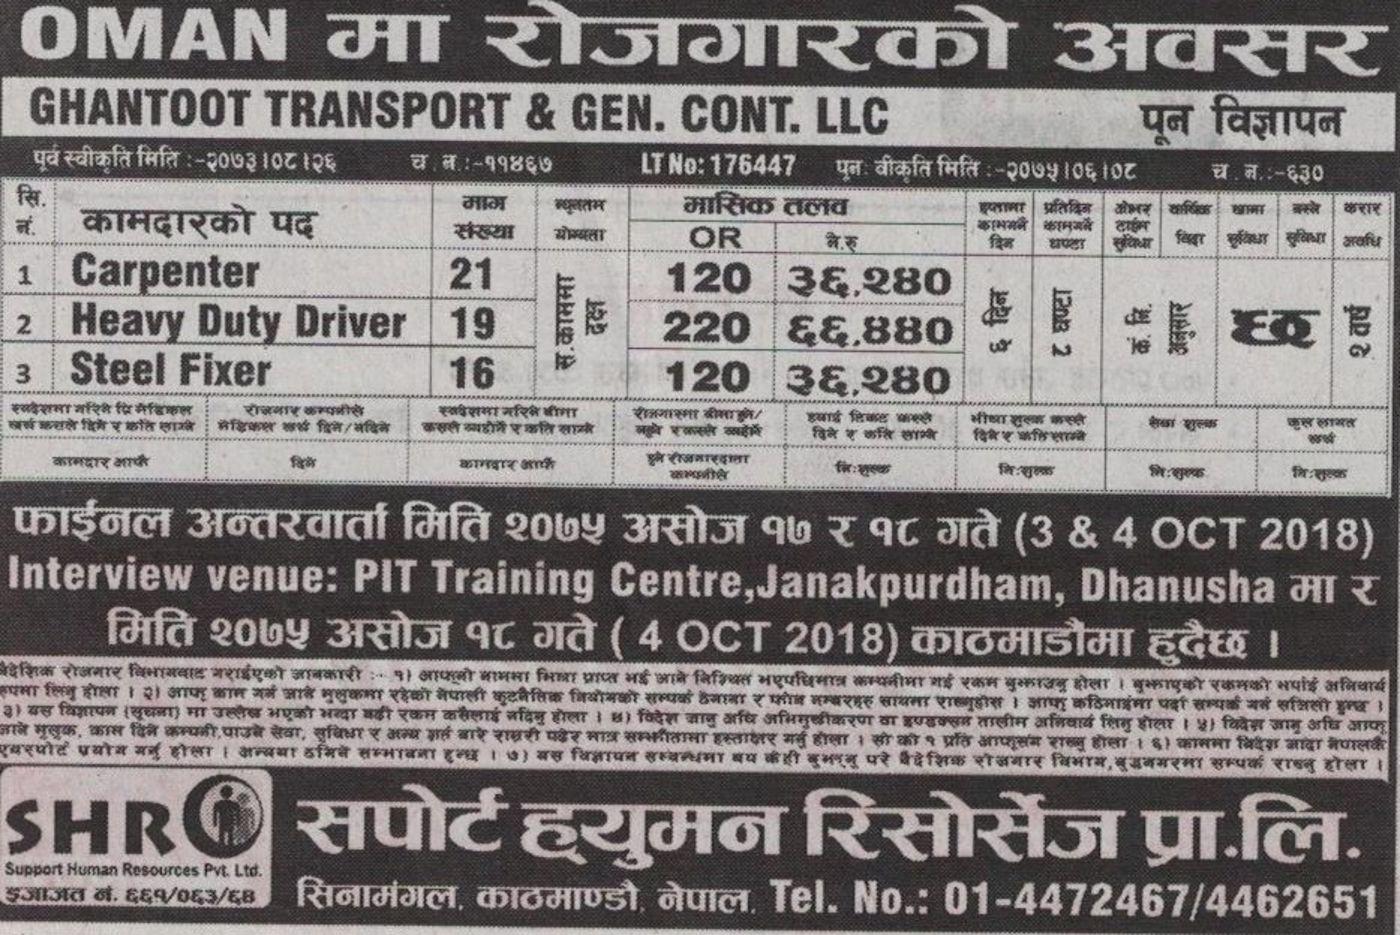 Jobs Nepal - Vacancy - Carpenter, Heavy Duty Driver, Steel Fixer